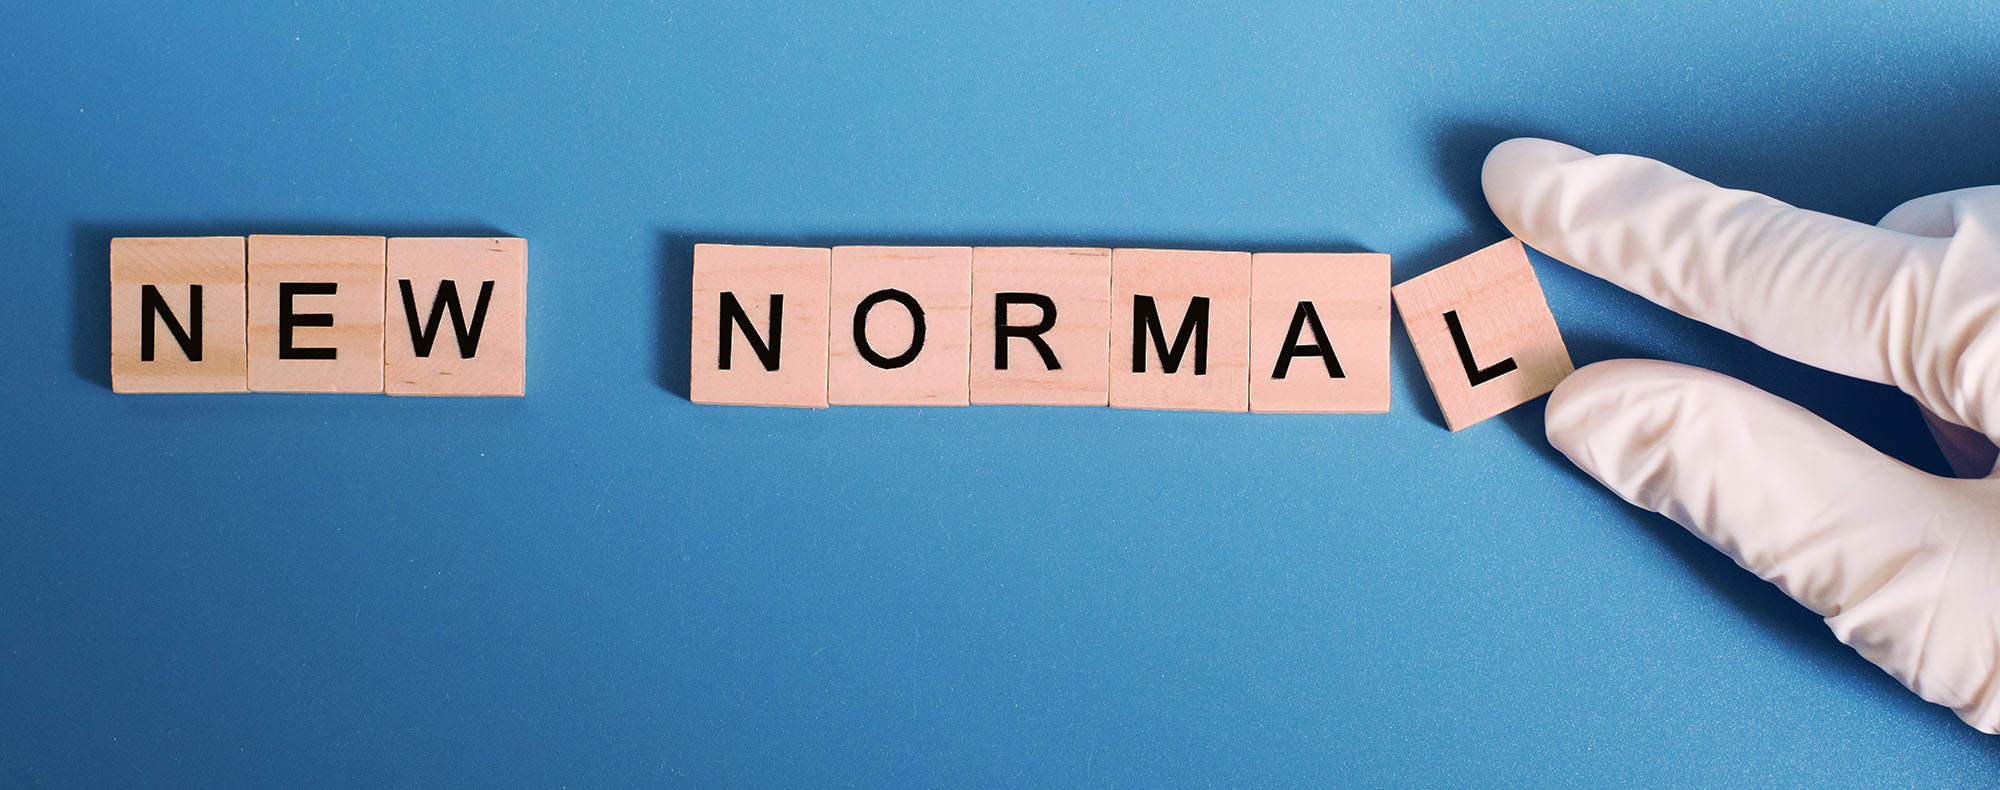 THE NEW NORMAL: BERUBAHNYA GAYA HIDUP